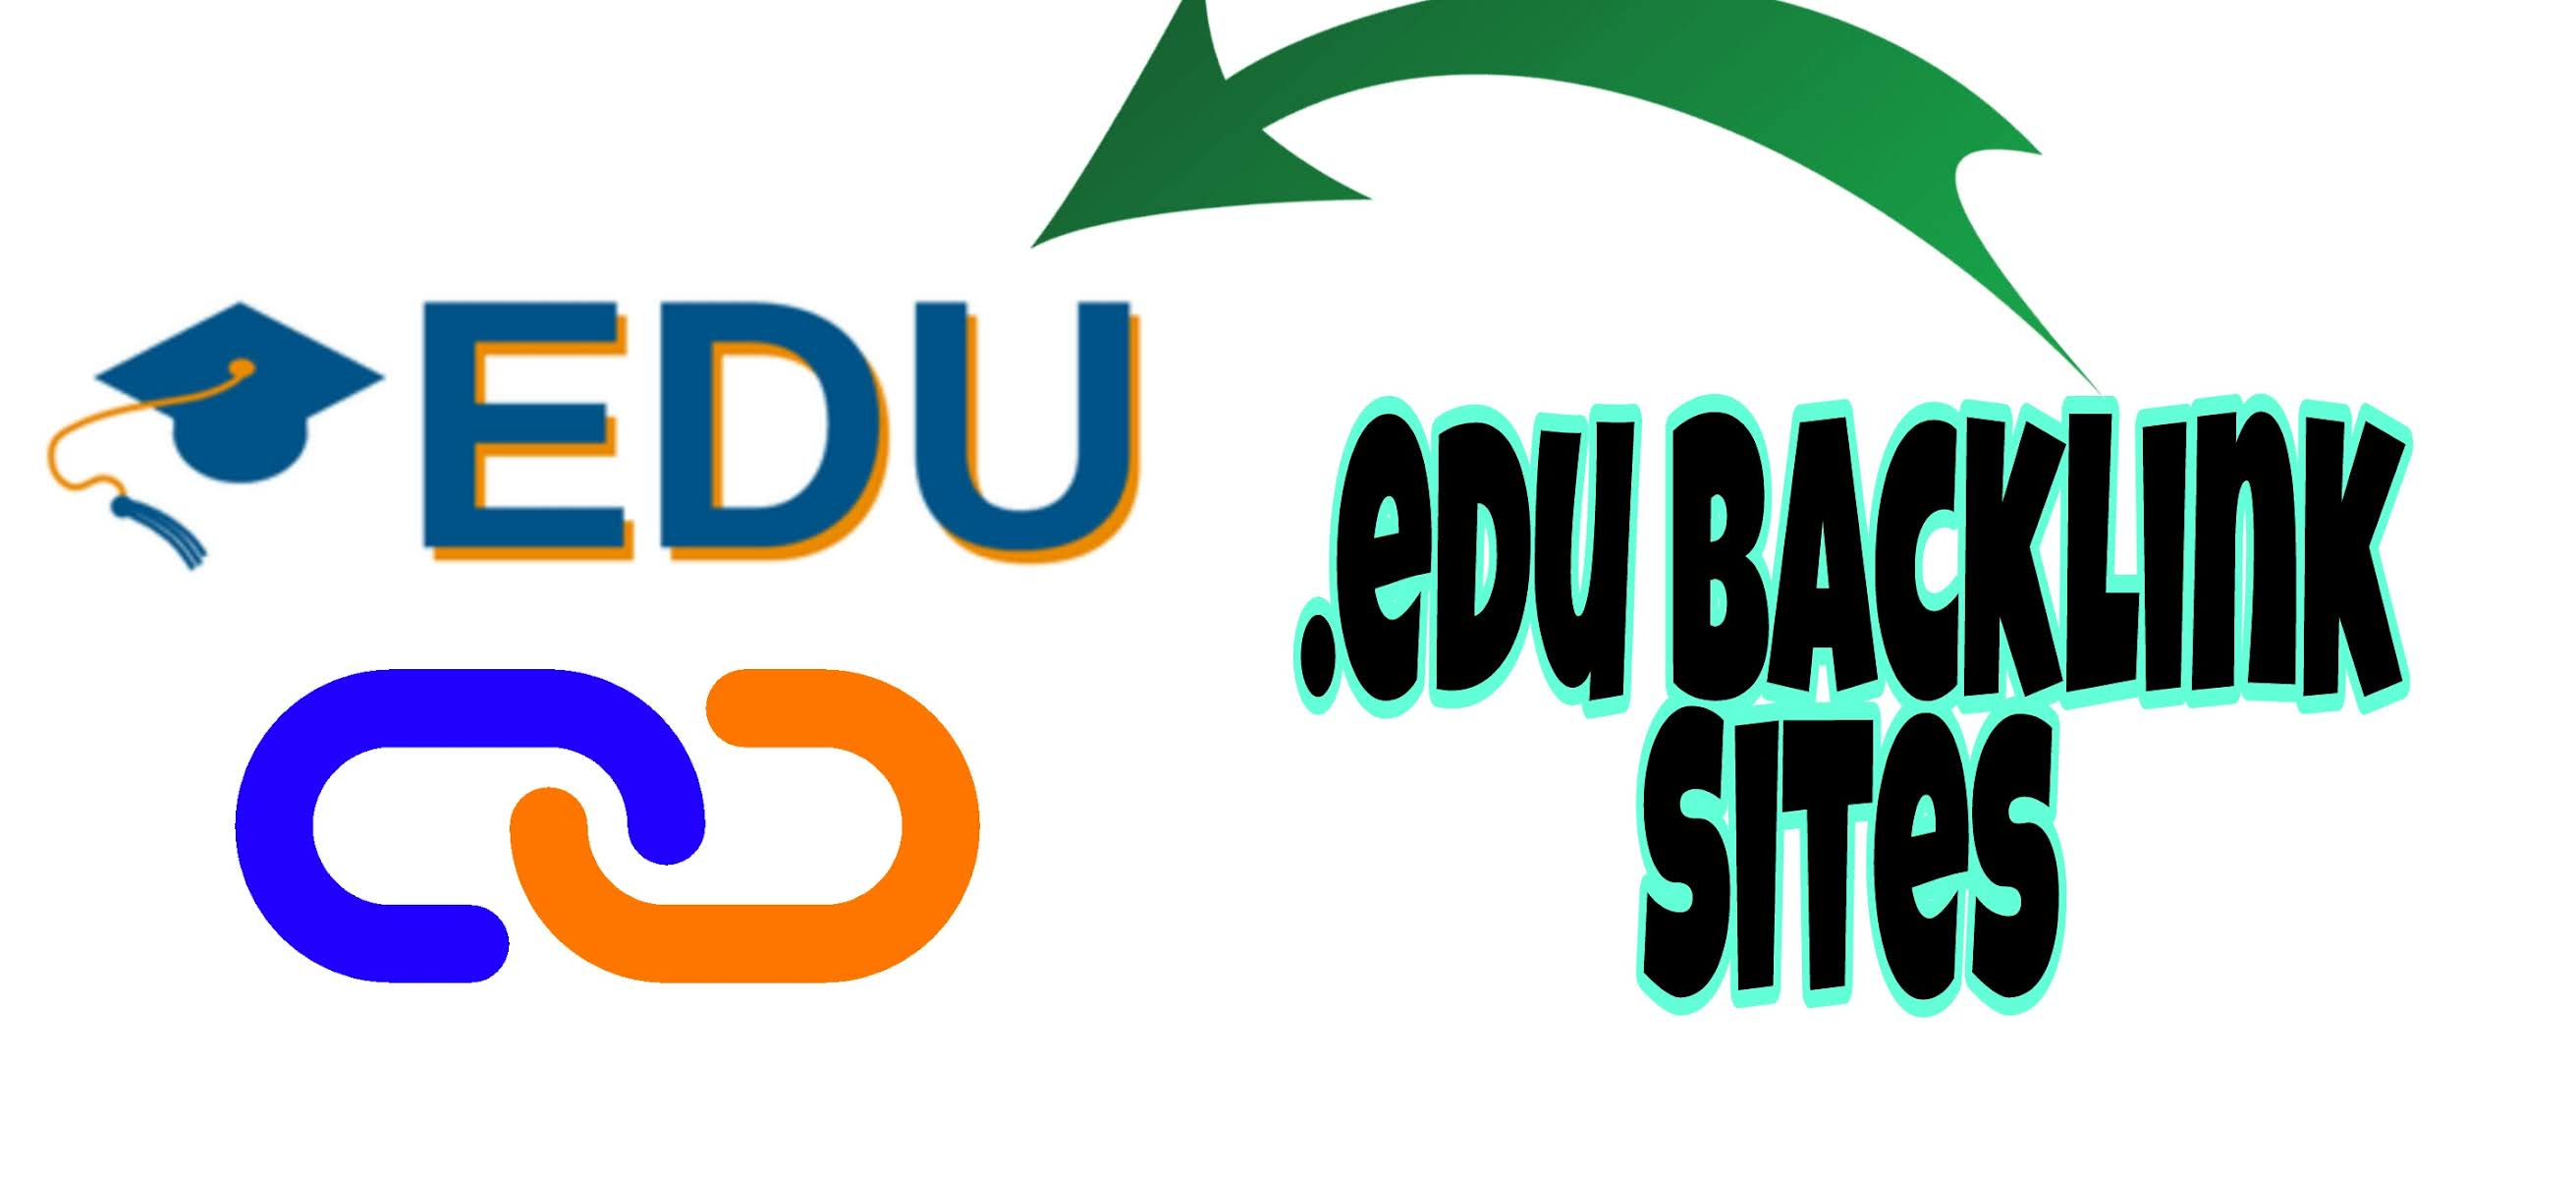 Edu Sites For Backlinks